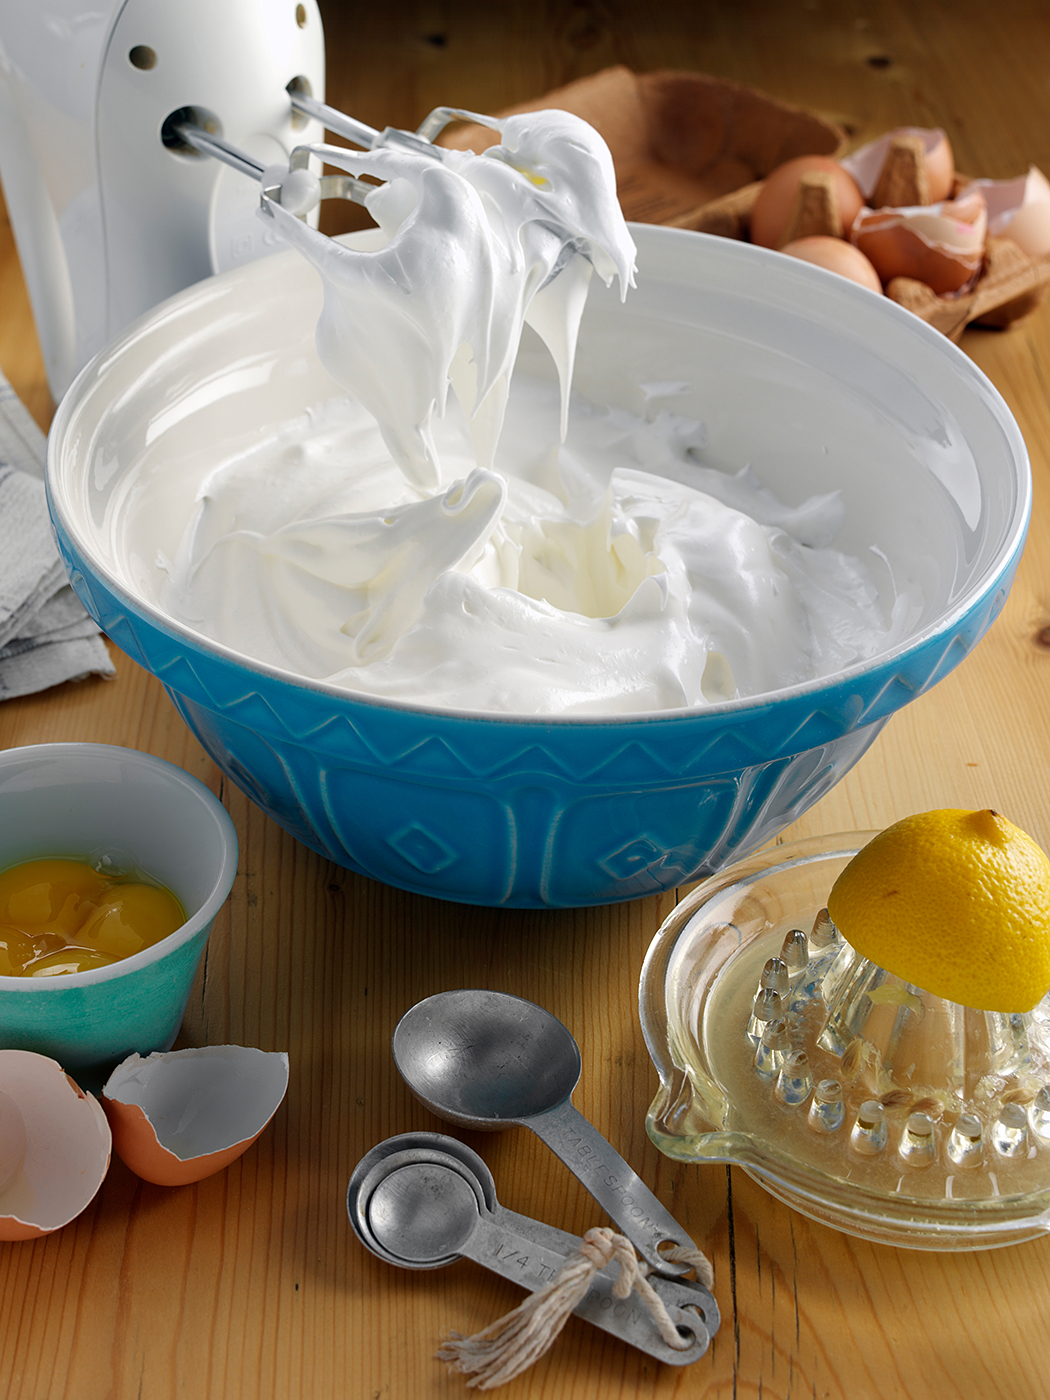 Italian meringue buttercream frosting